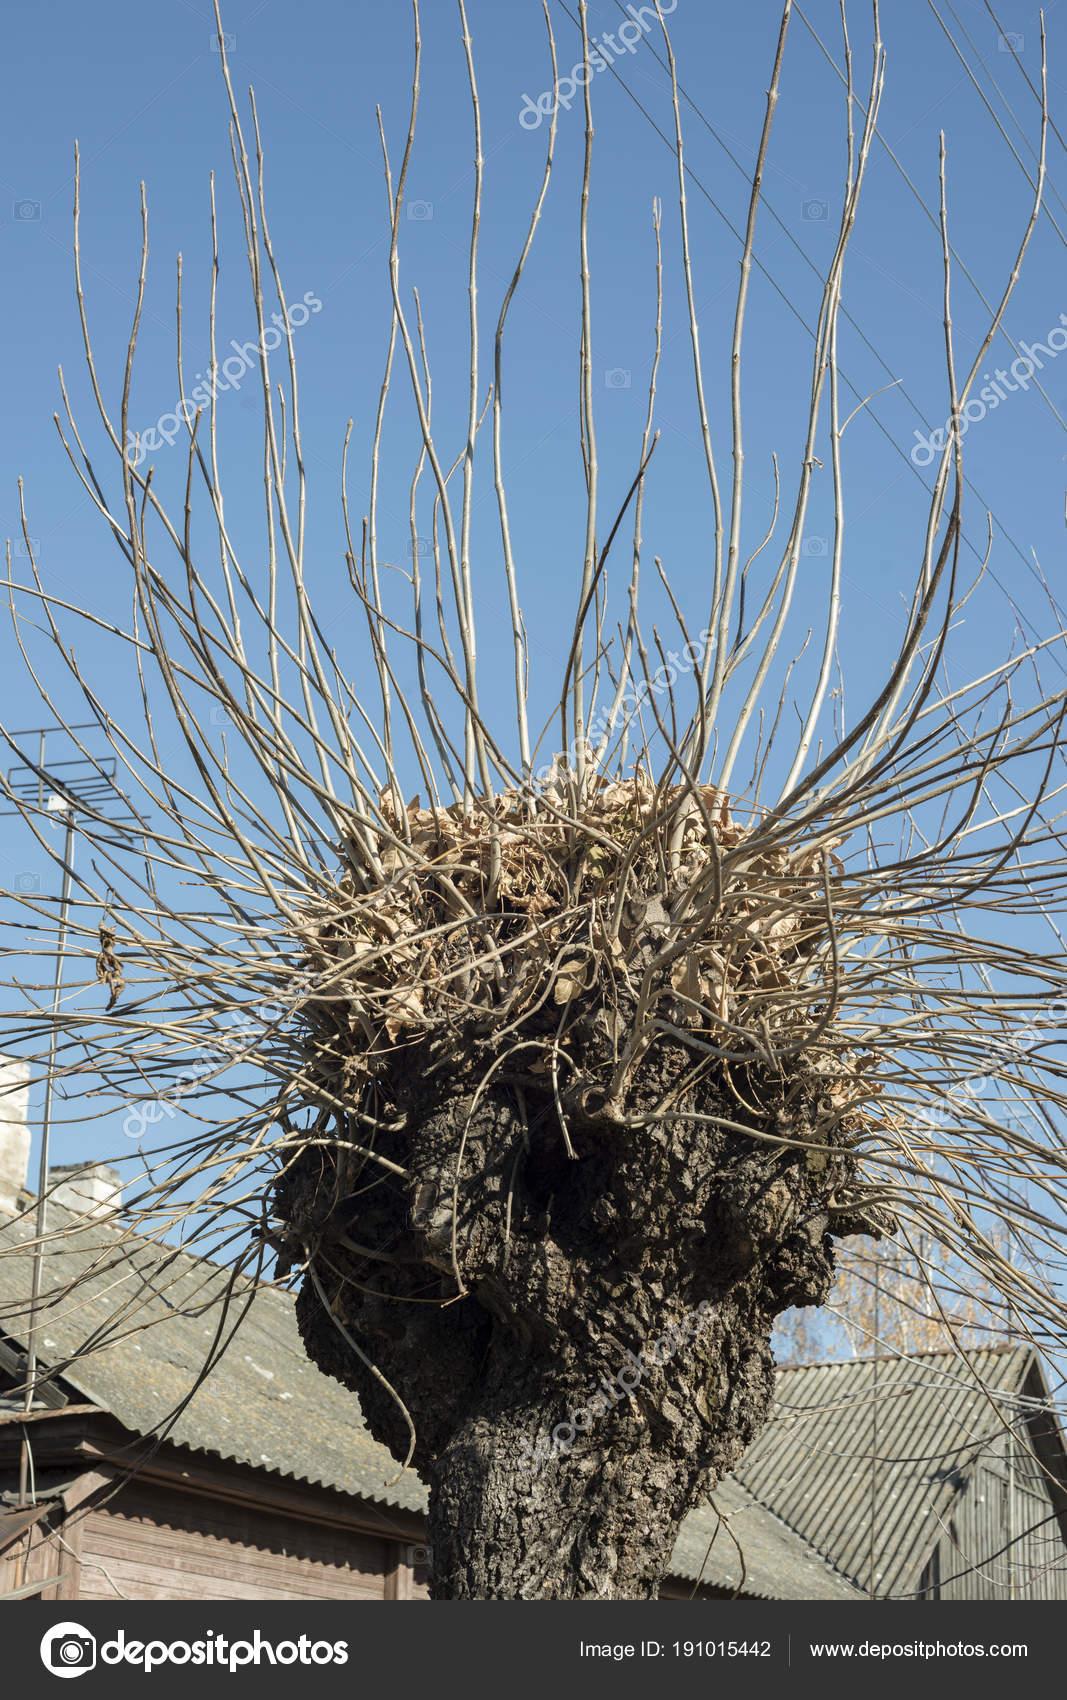 spooky tree sprouts stock photo yurizap 191015442